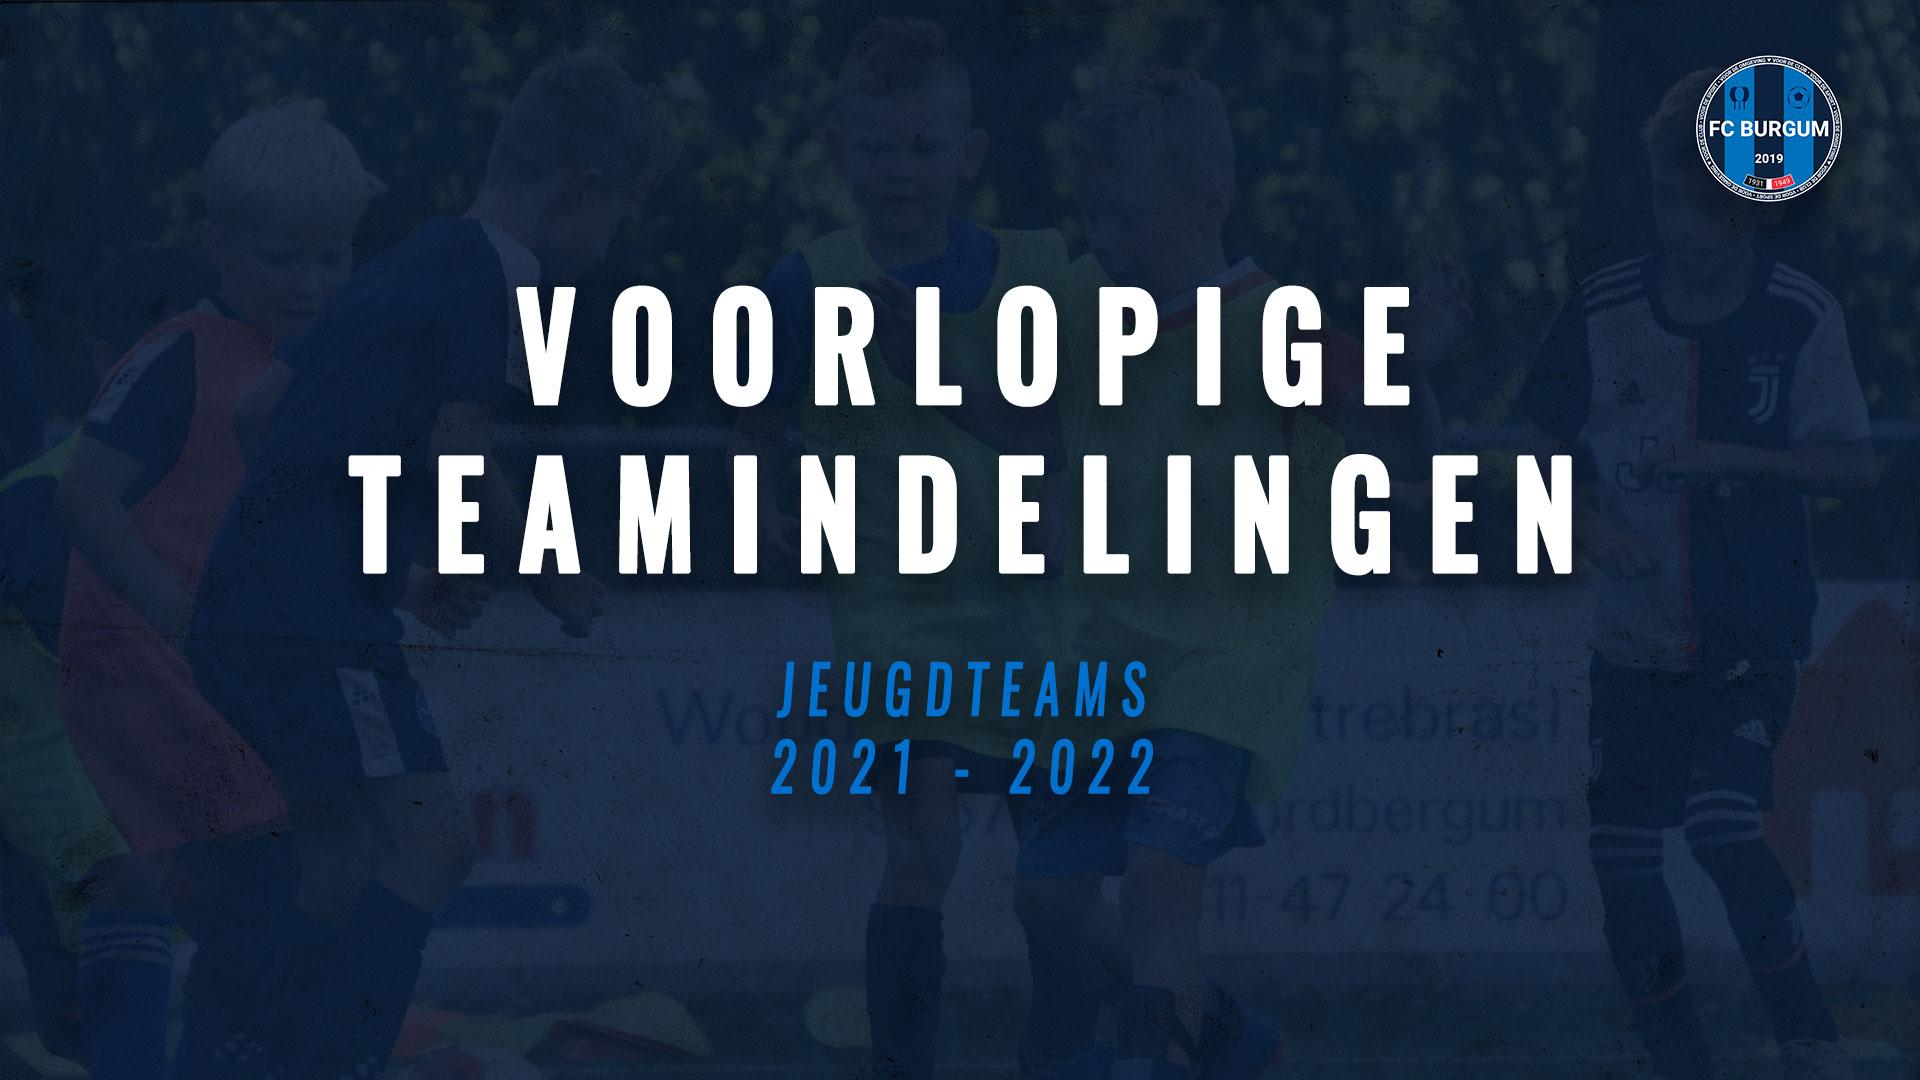 Voorlopige teamindelingen jeugdteams 2021-2022